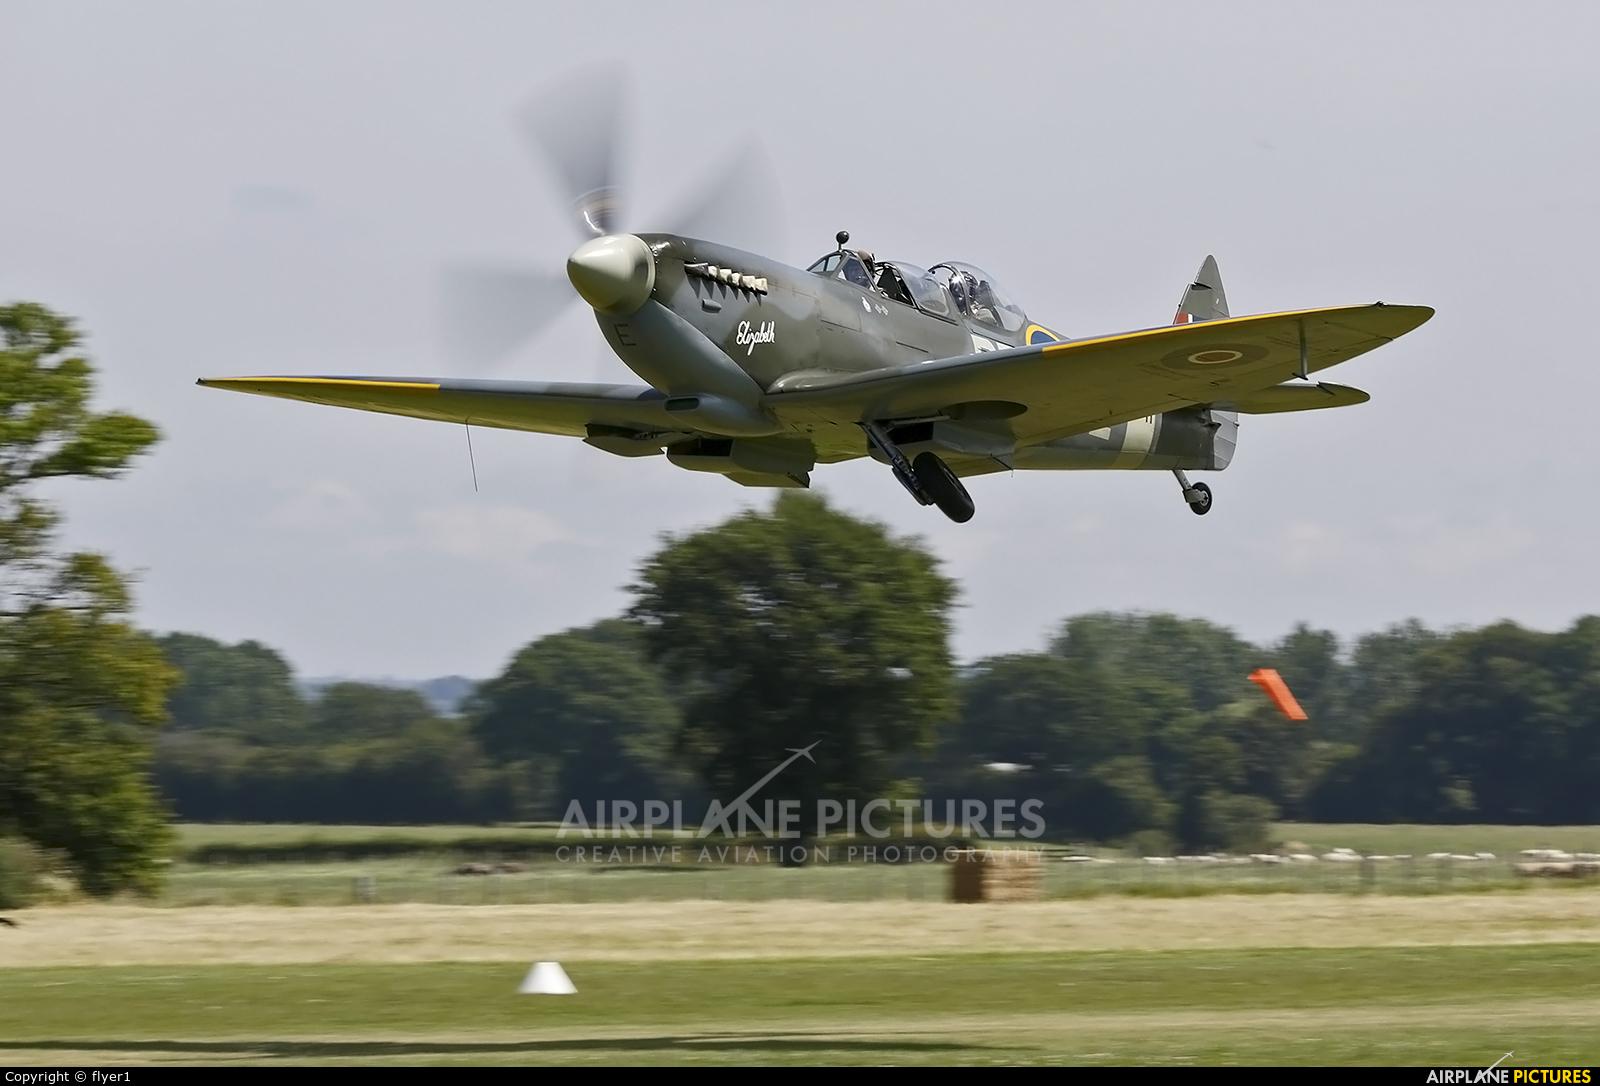 Aero Legends G-CICK aircraft at Lashenden / Headcorn